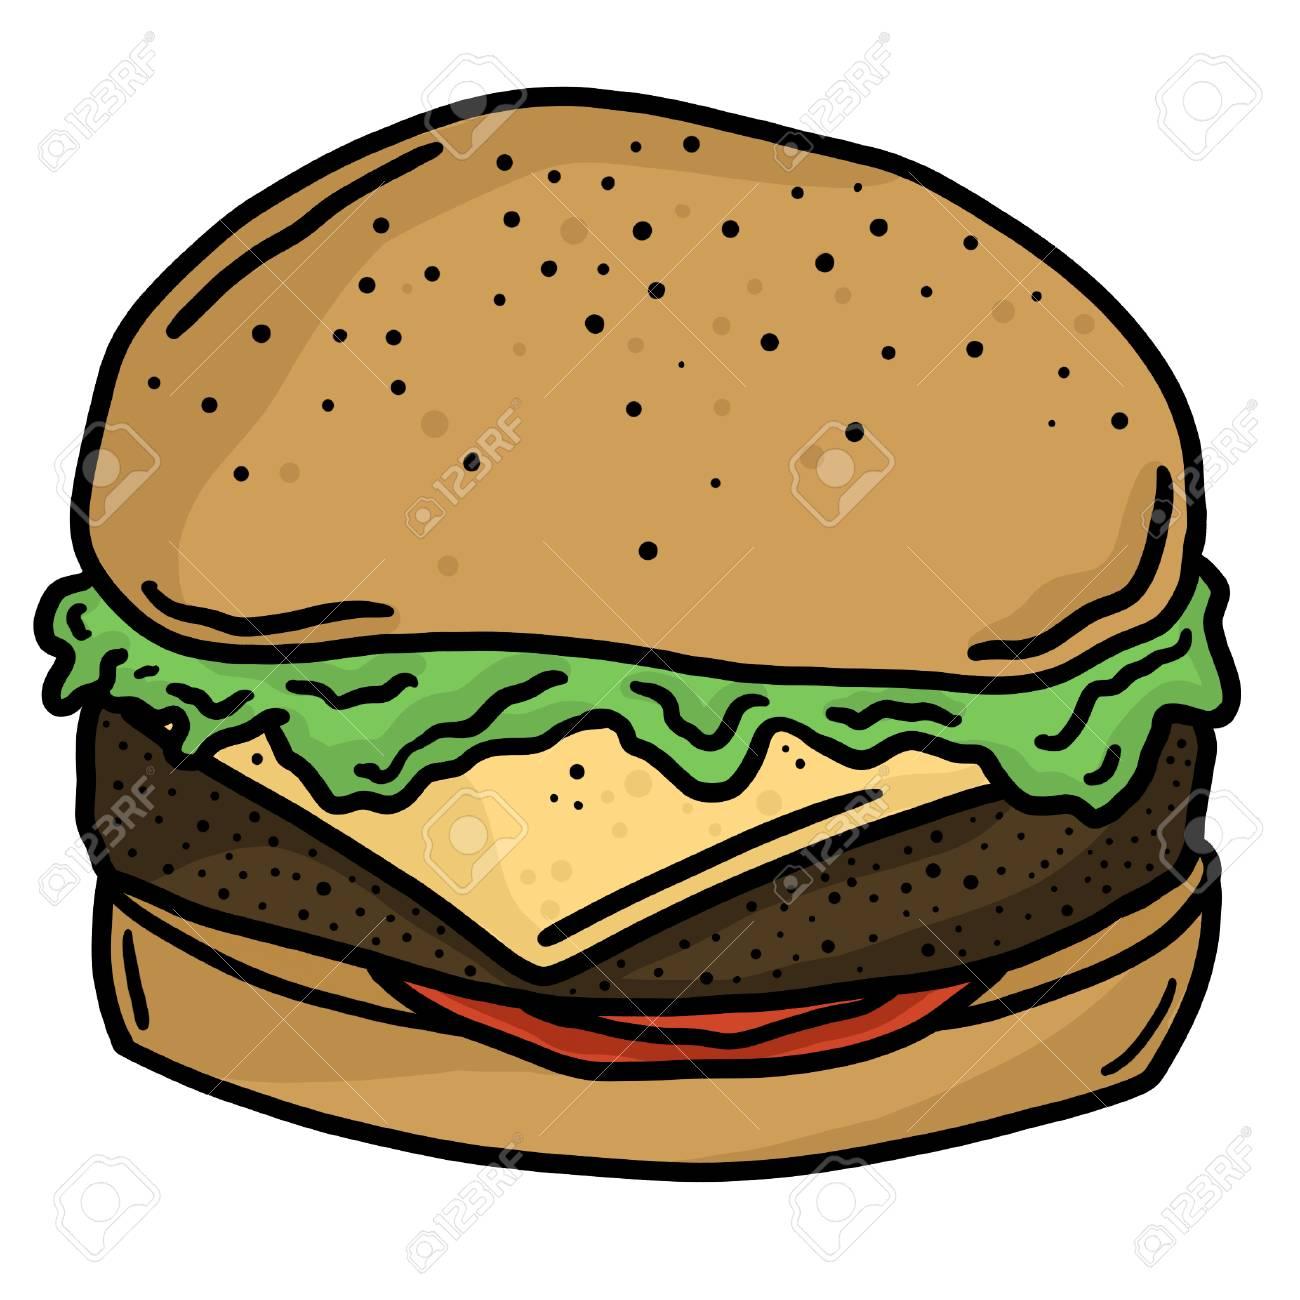 Beef Burger Fast Food Line Art Vector Illustration Clip Art.